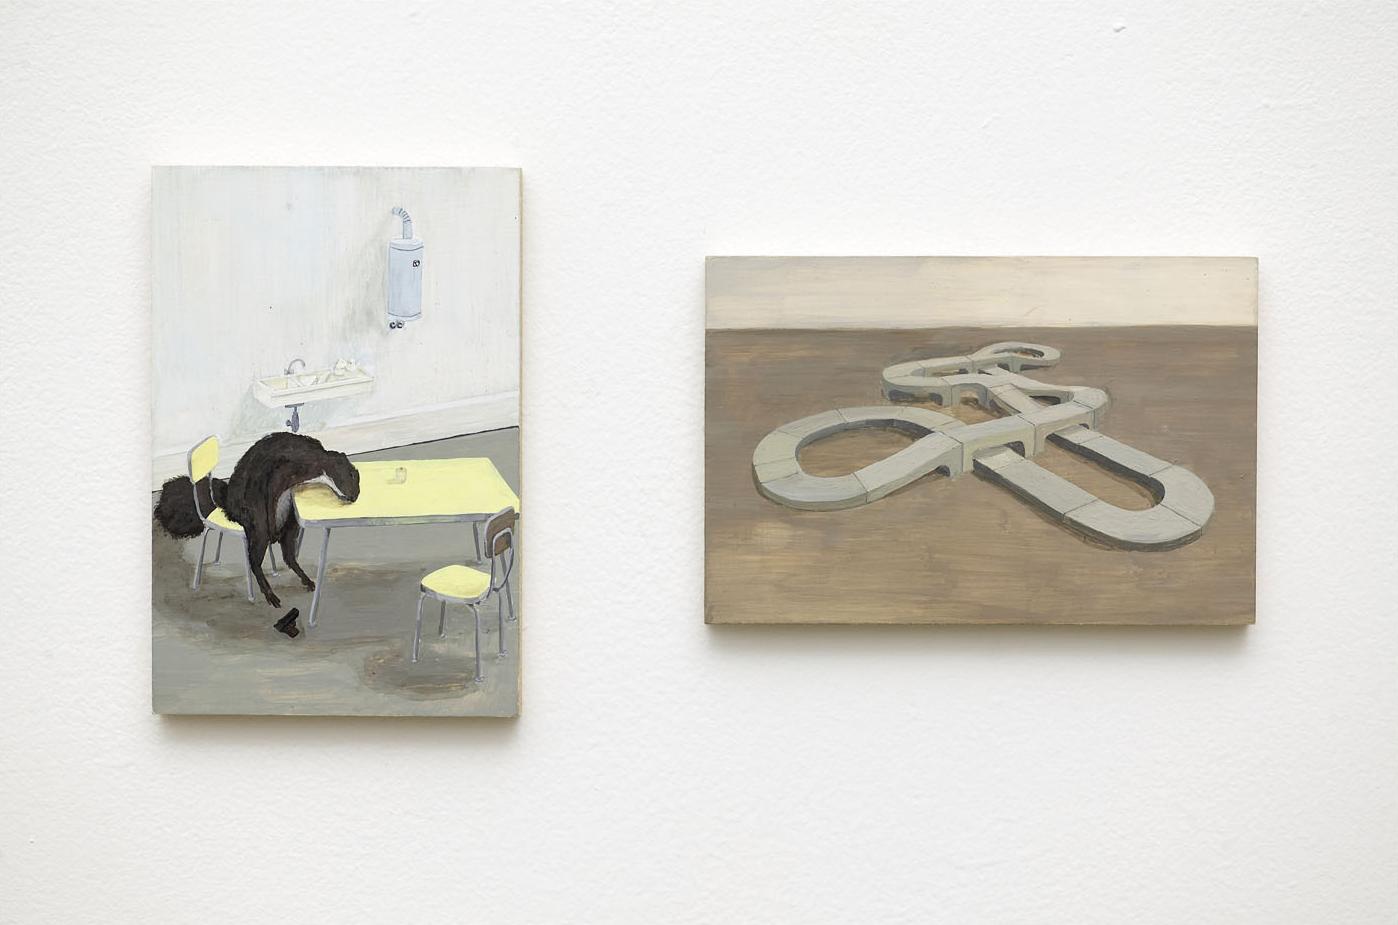 MAURIZIO + JULIAN Acrylic on Plywood 2 Panels Each 10 x 15 cm